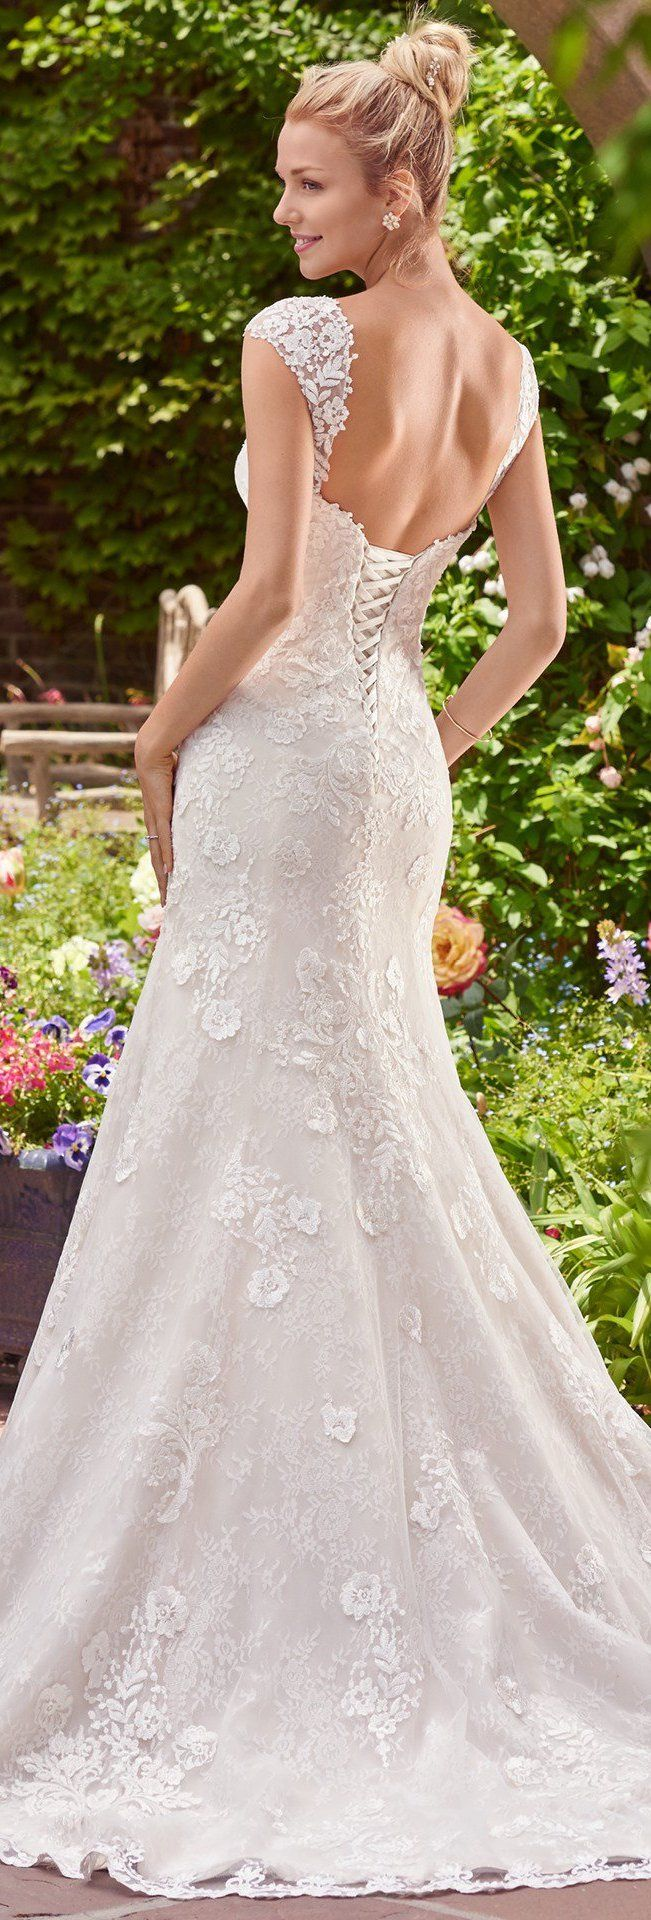 Maggie sottero wedding dresses wedding dress weddings and wedding bridal dresses ombrellifo Images